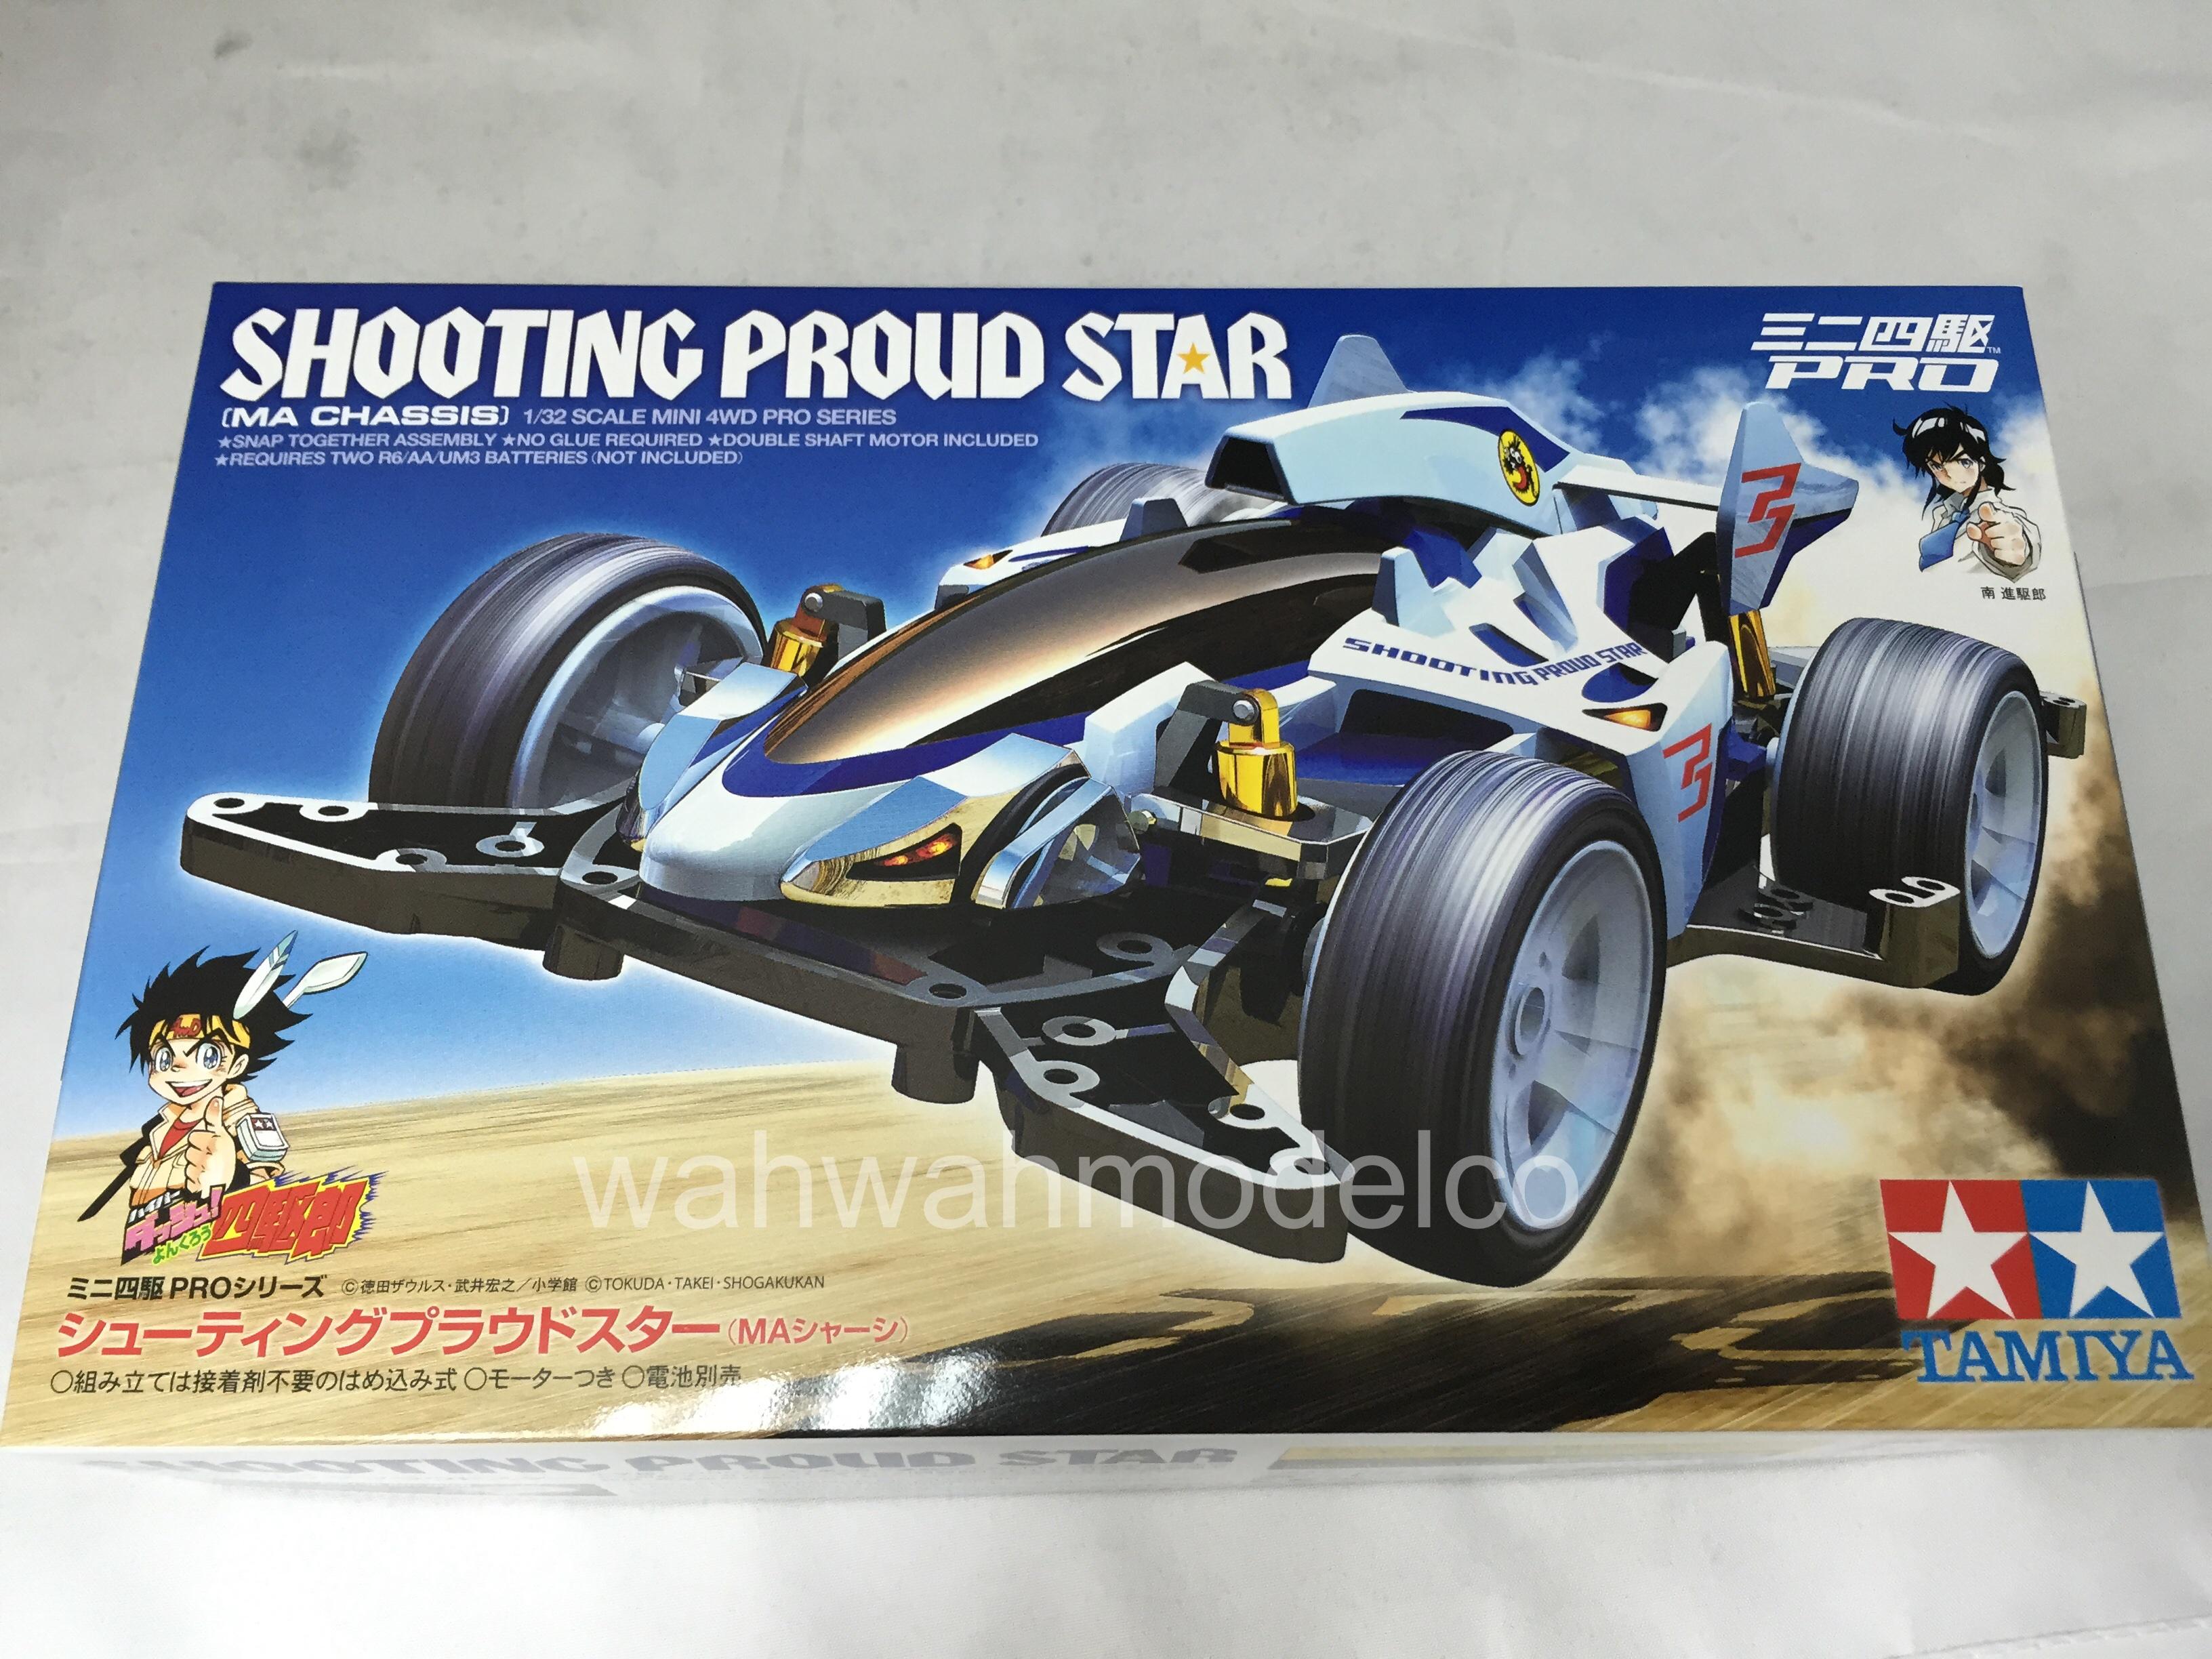 tamiya 18641 1 32 jr shooting proud star